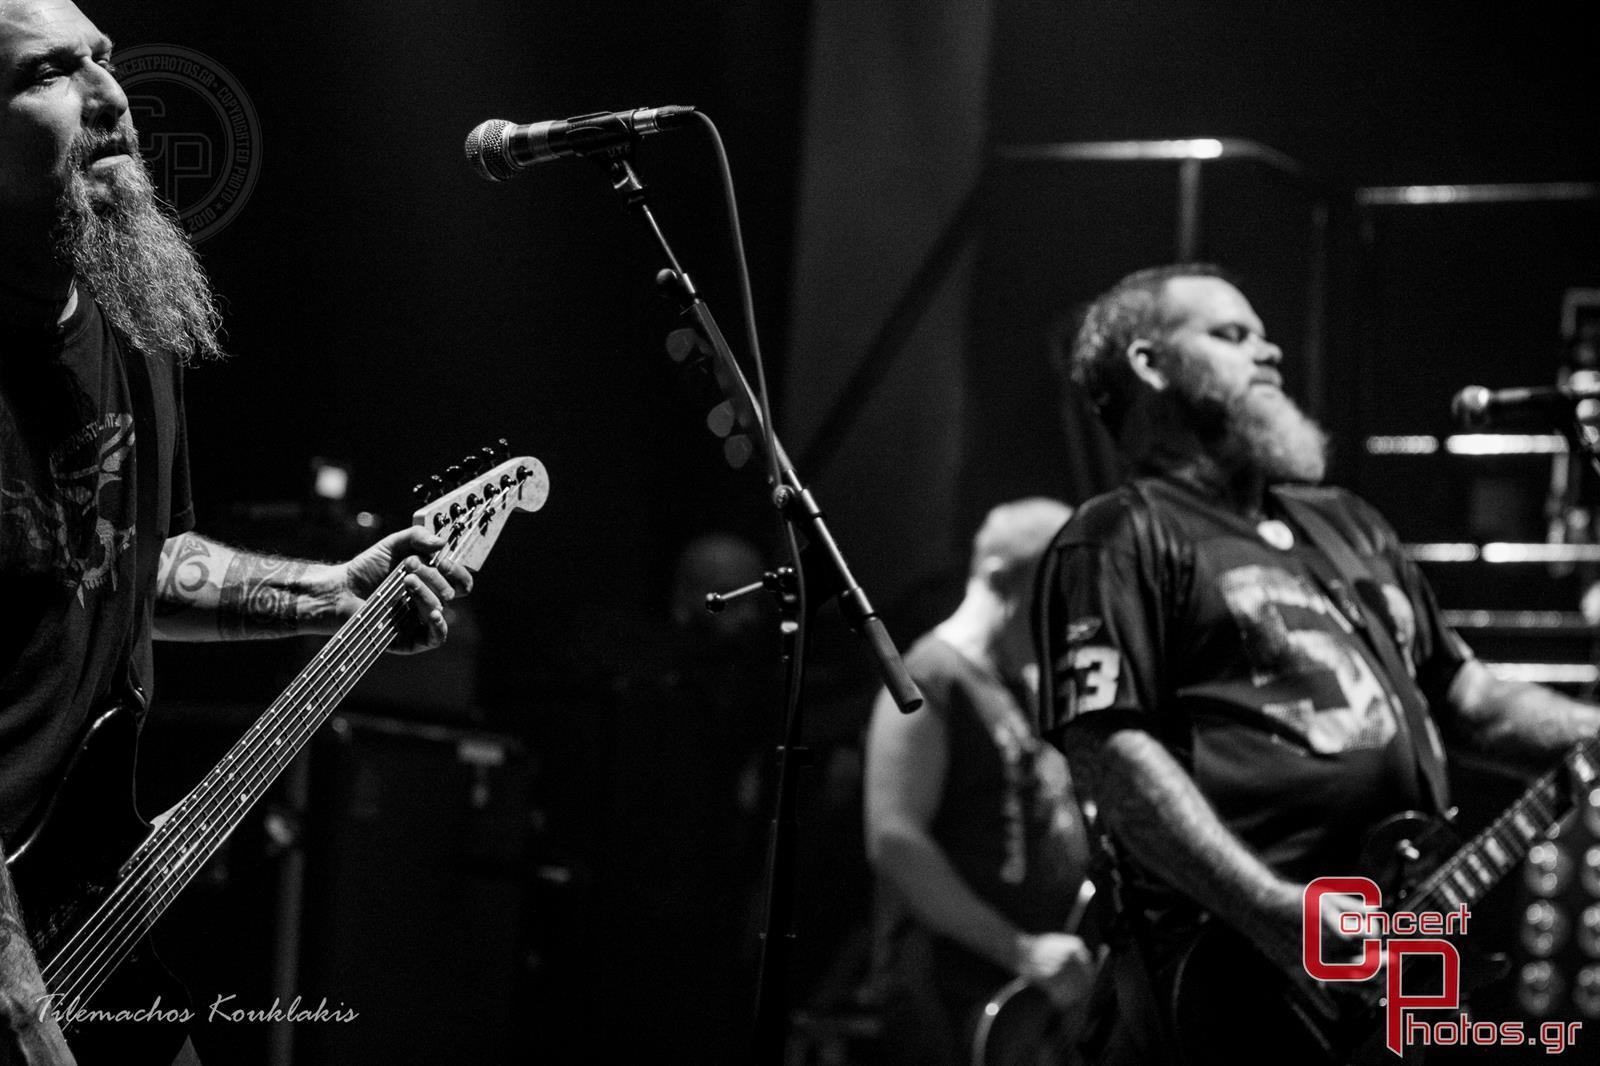 Neurosis-Neurosis photographer:  - concertphotos_20140707_23_56_51